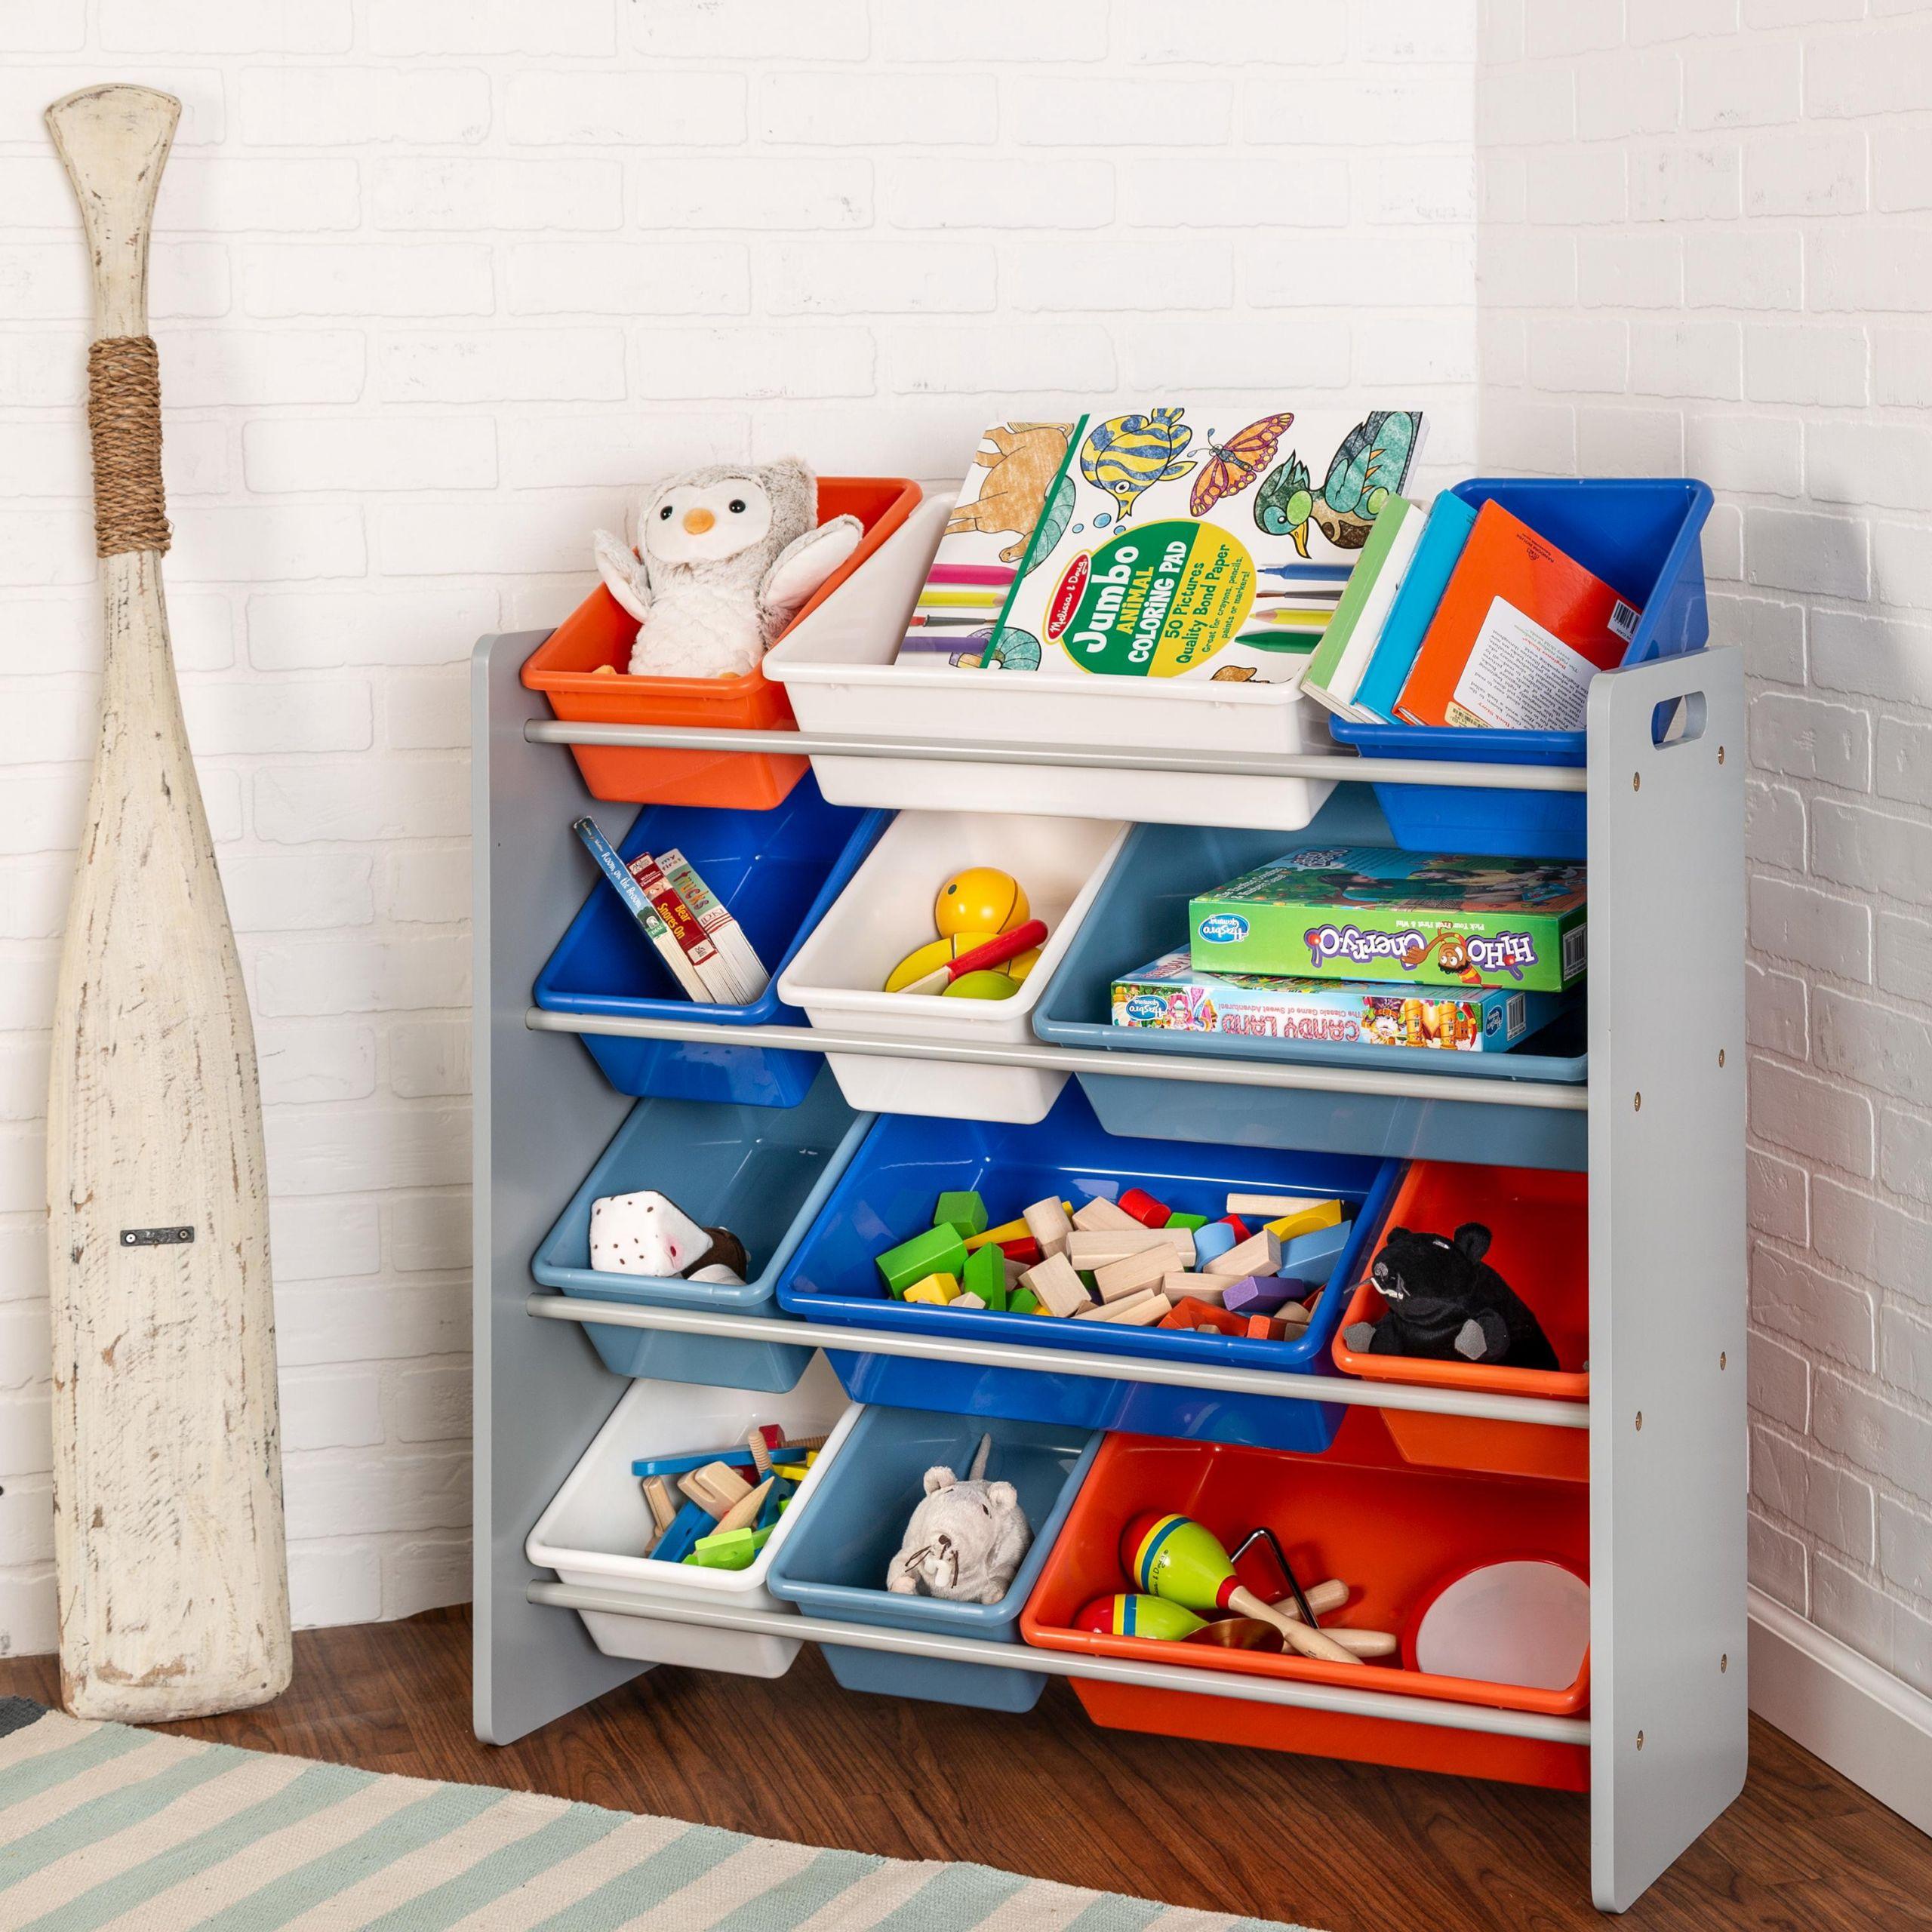 Kids Toys Storage  Amazon Honey Can Do SRT Kids Toy Organizer and